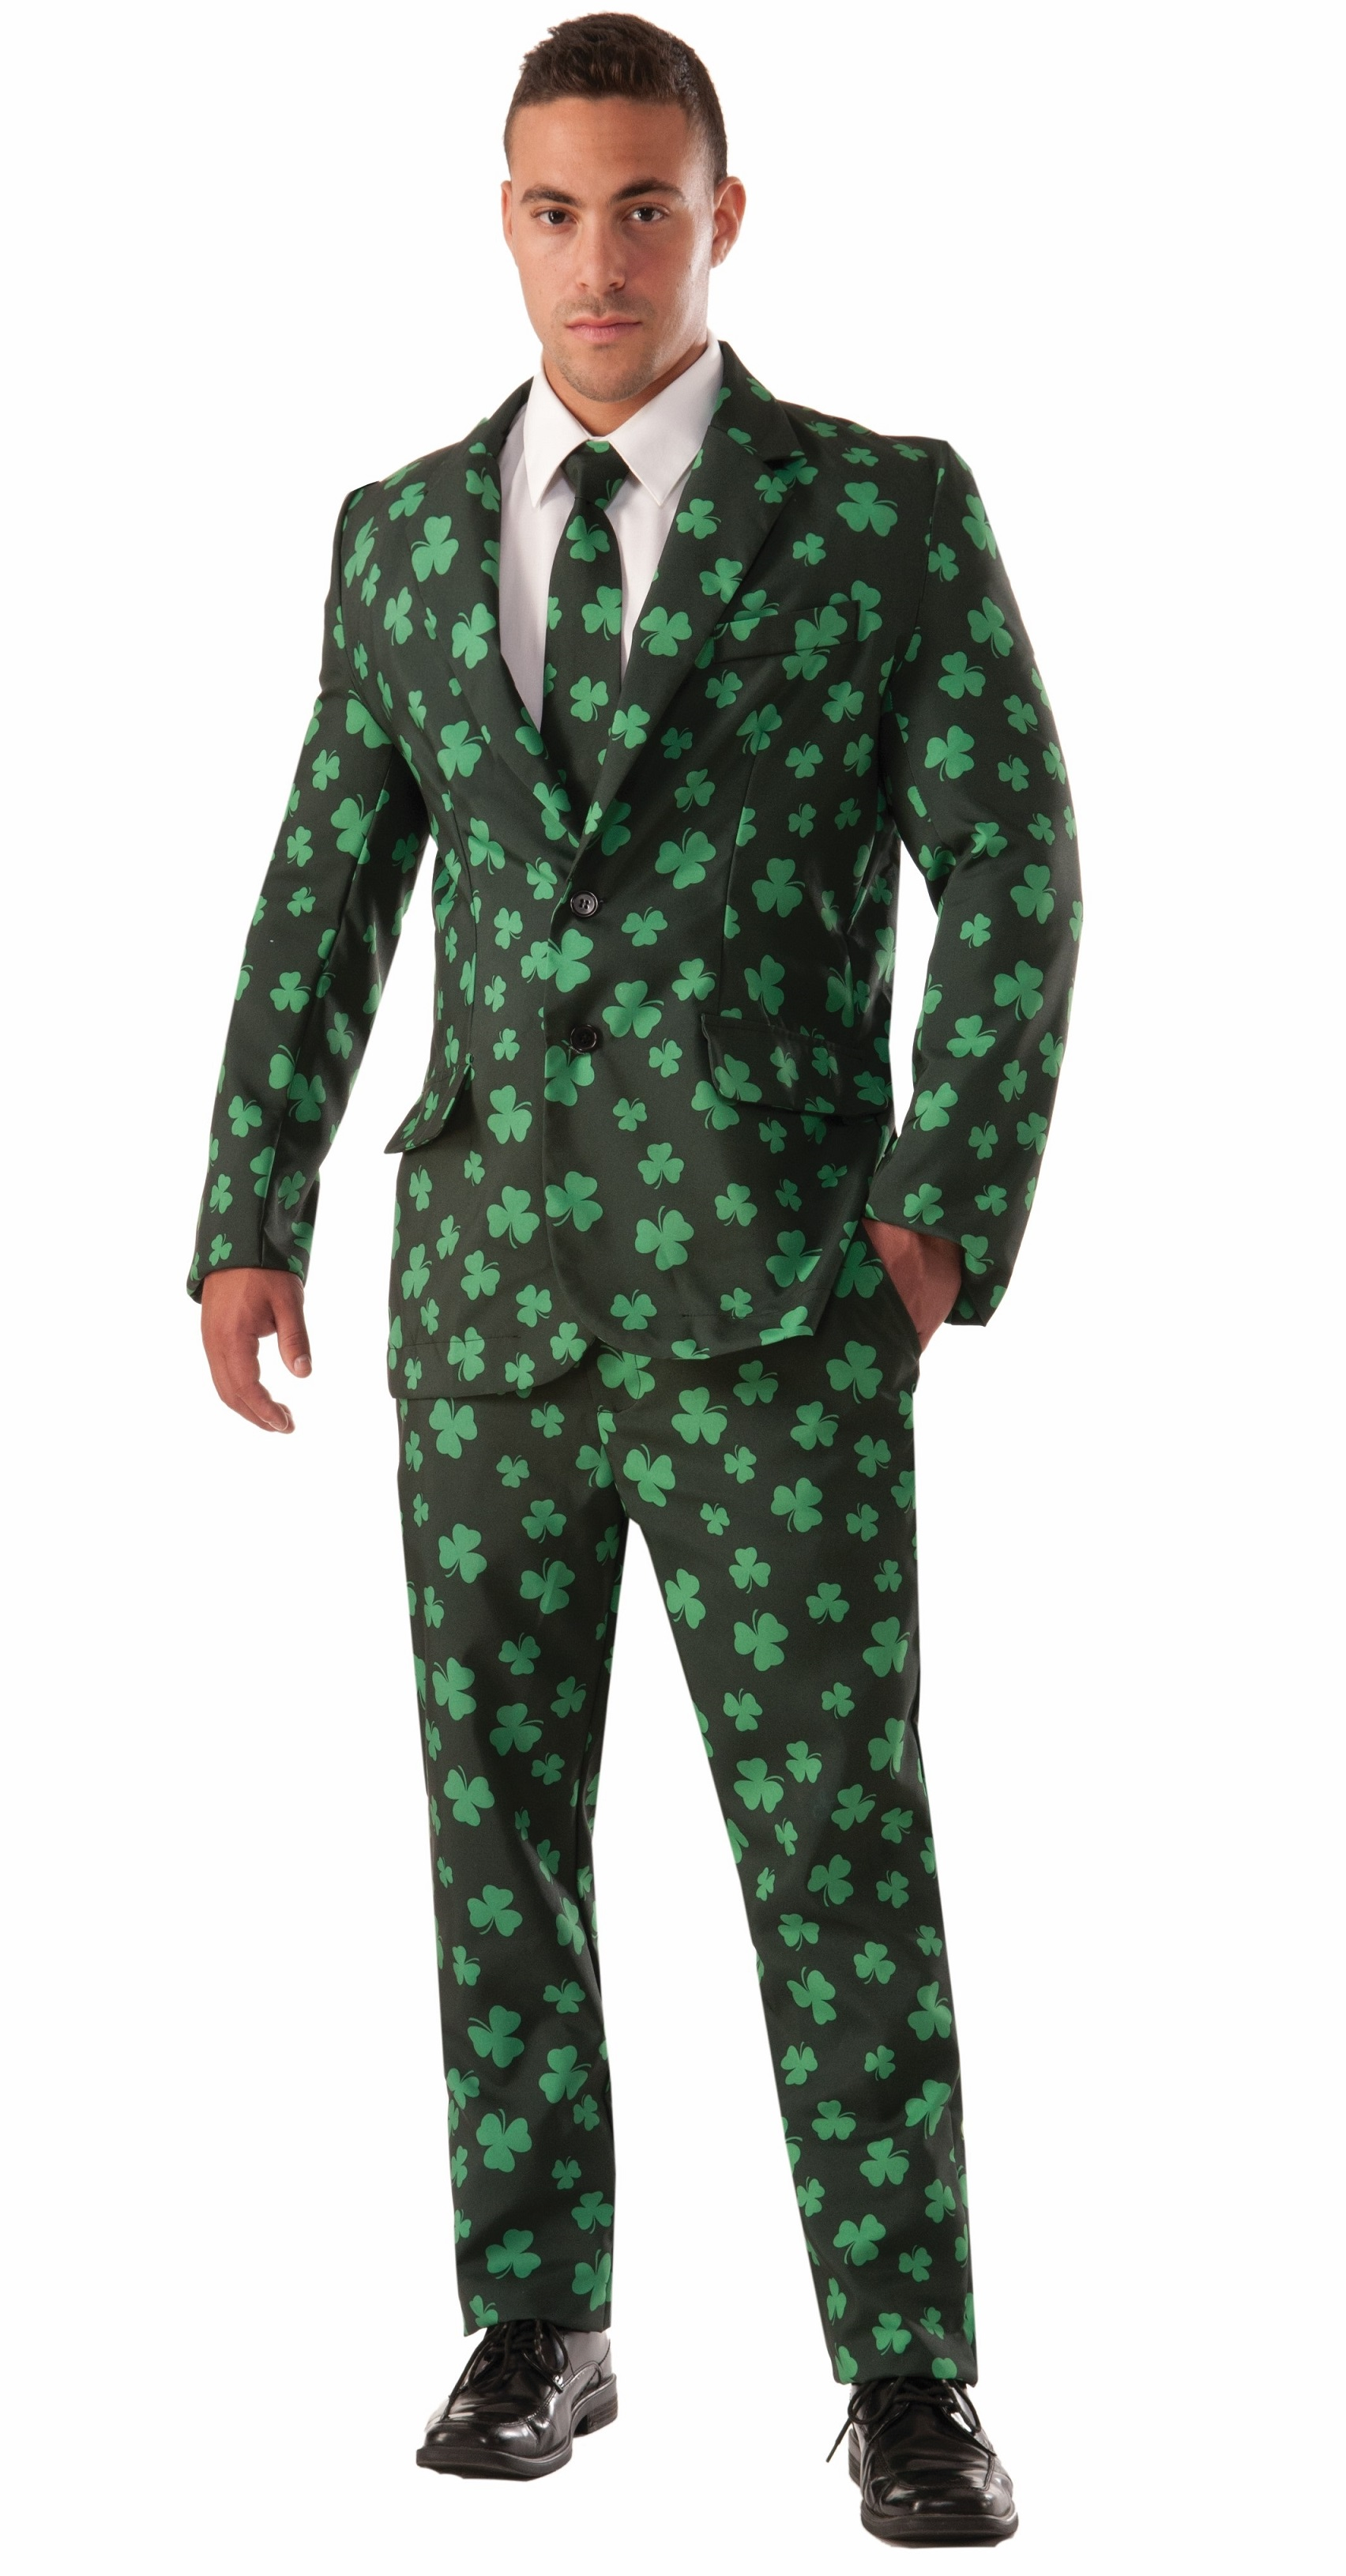 76c06a2cee535e Details about Shamrock Suit St Patricks Patrick'S Day Green Irish Tie  Leprechaun Mens Costume